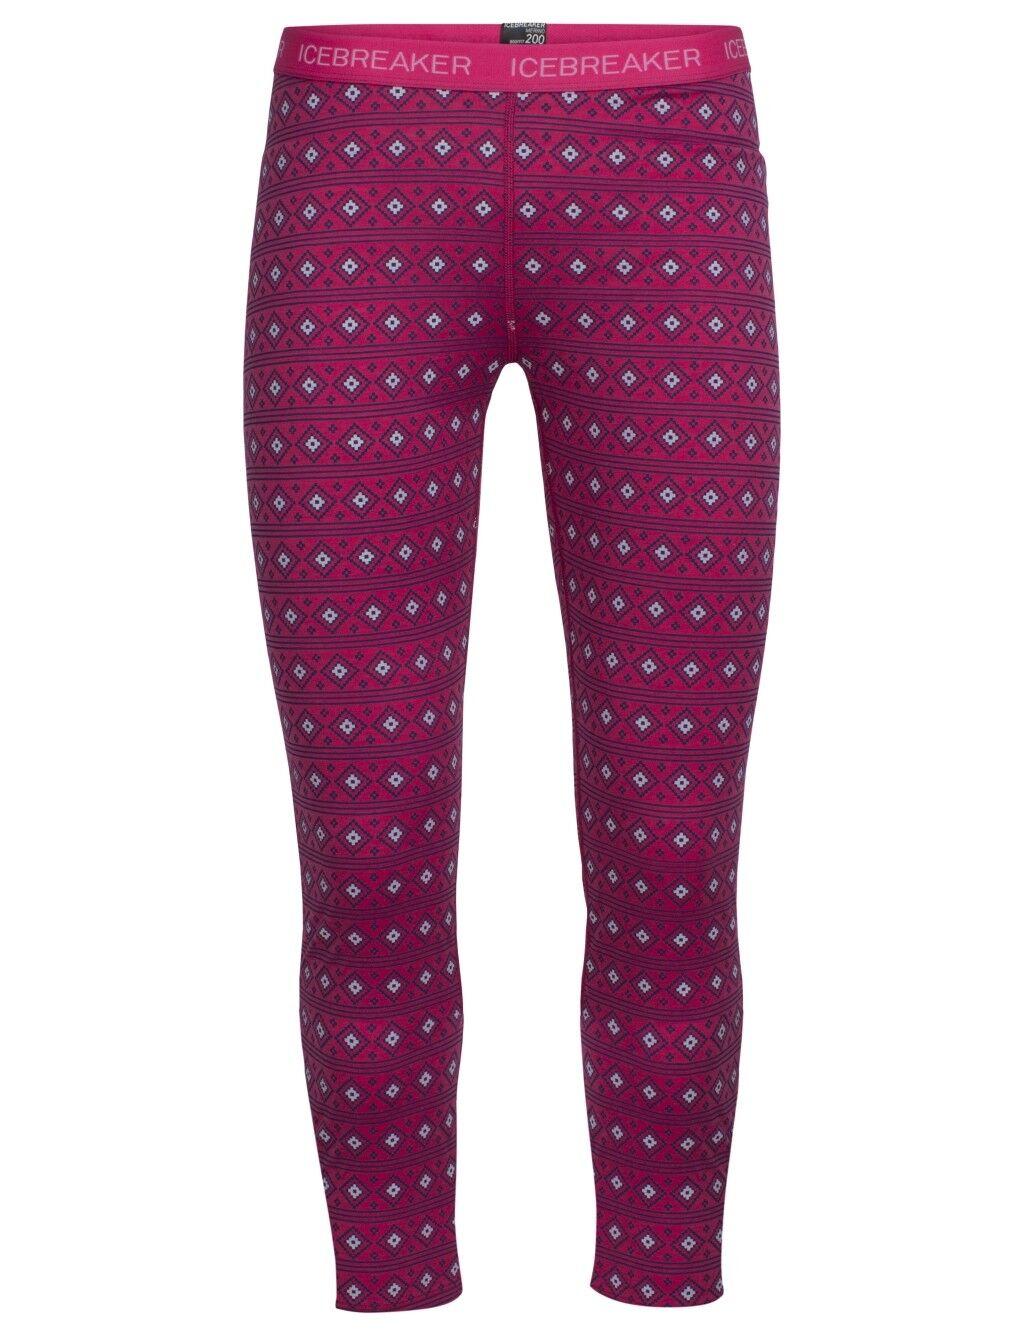 Icebreaker Kids Oasis Leggings, Align Pop Pink, Size J14